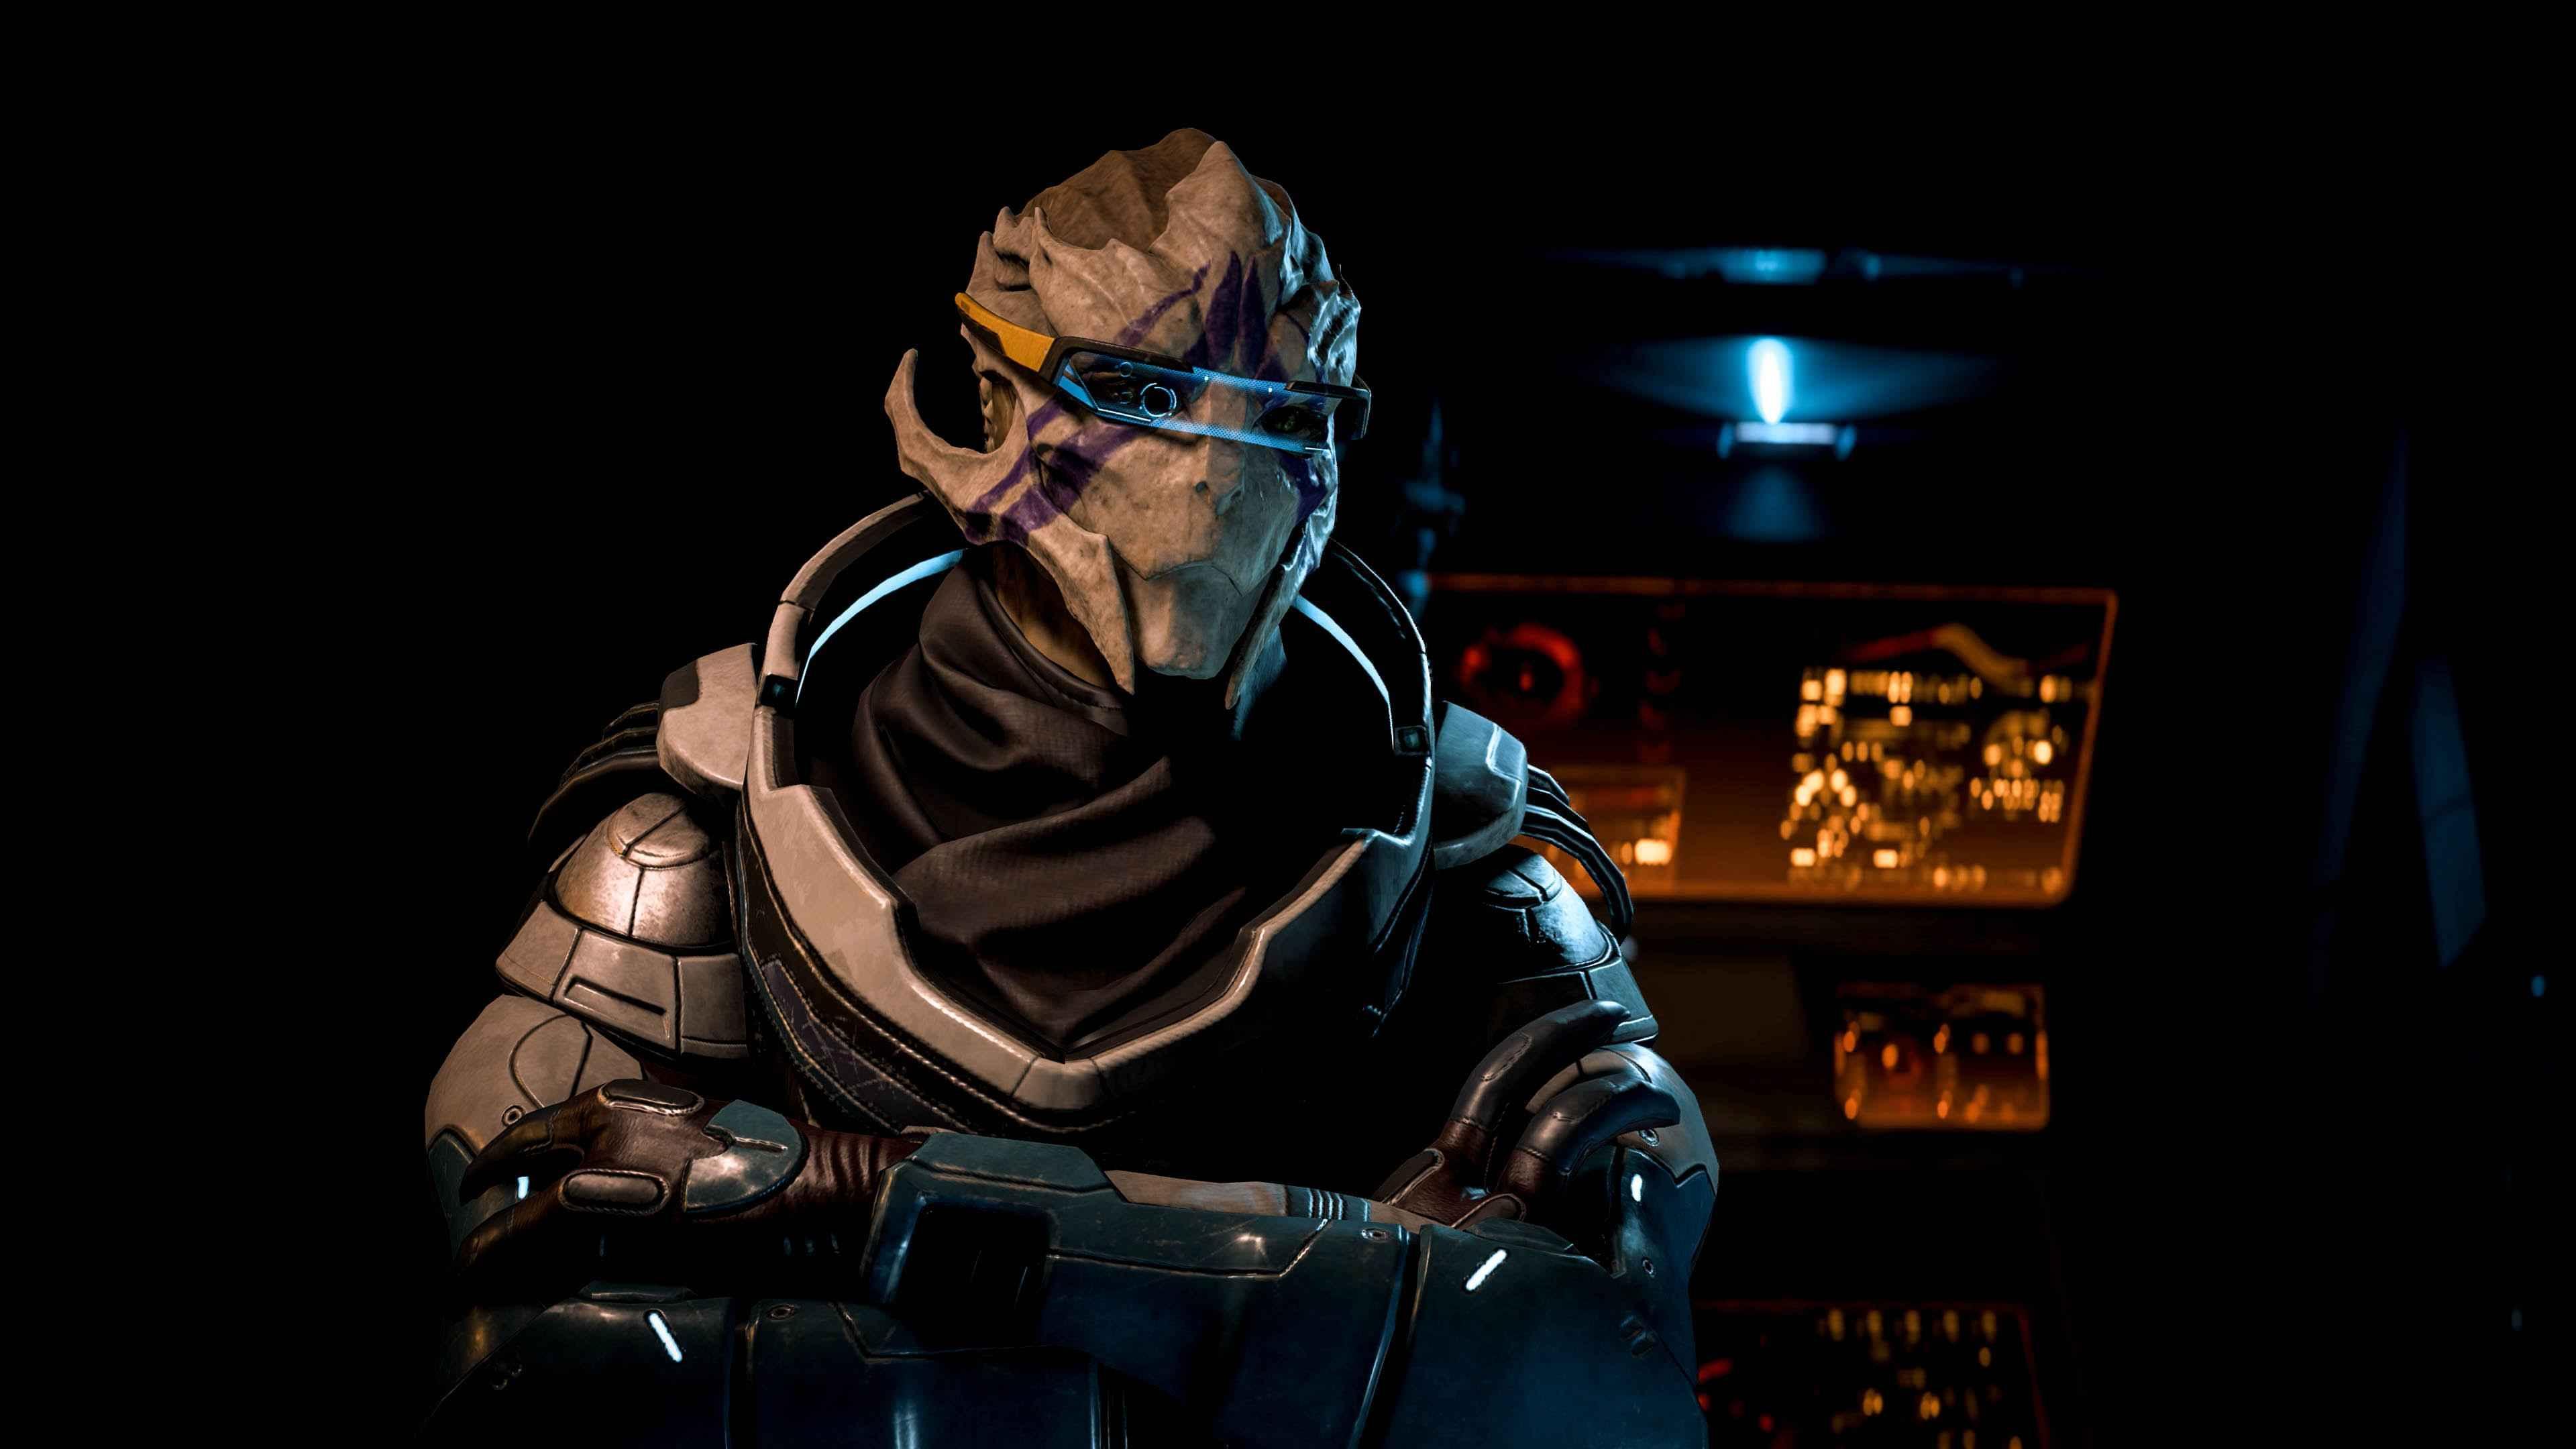 Bericht: Mass Effect: Andromeda - Serie wird auf Eis gelegt